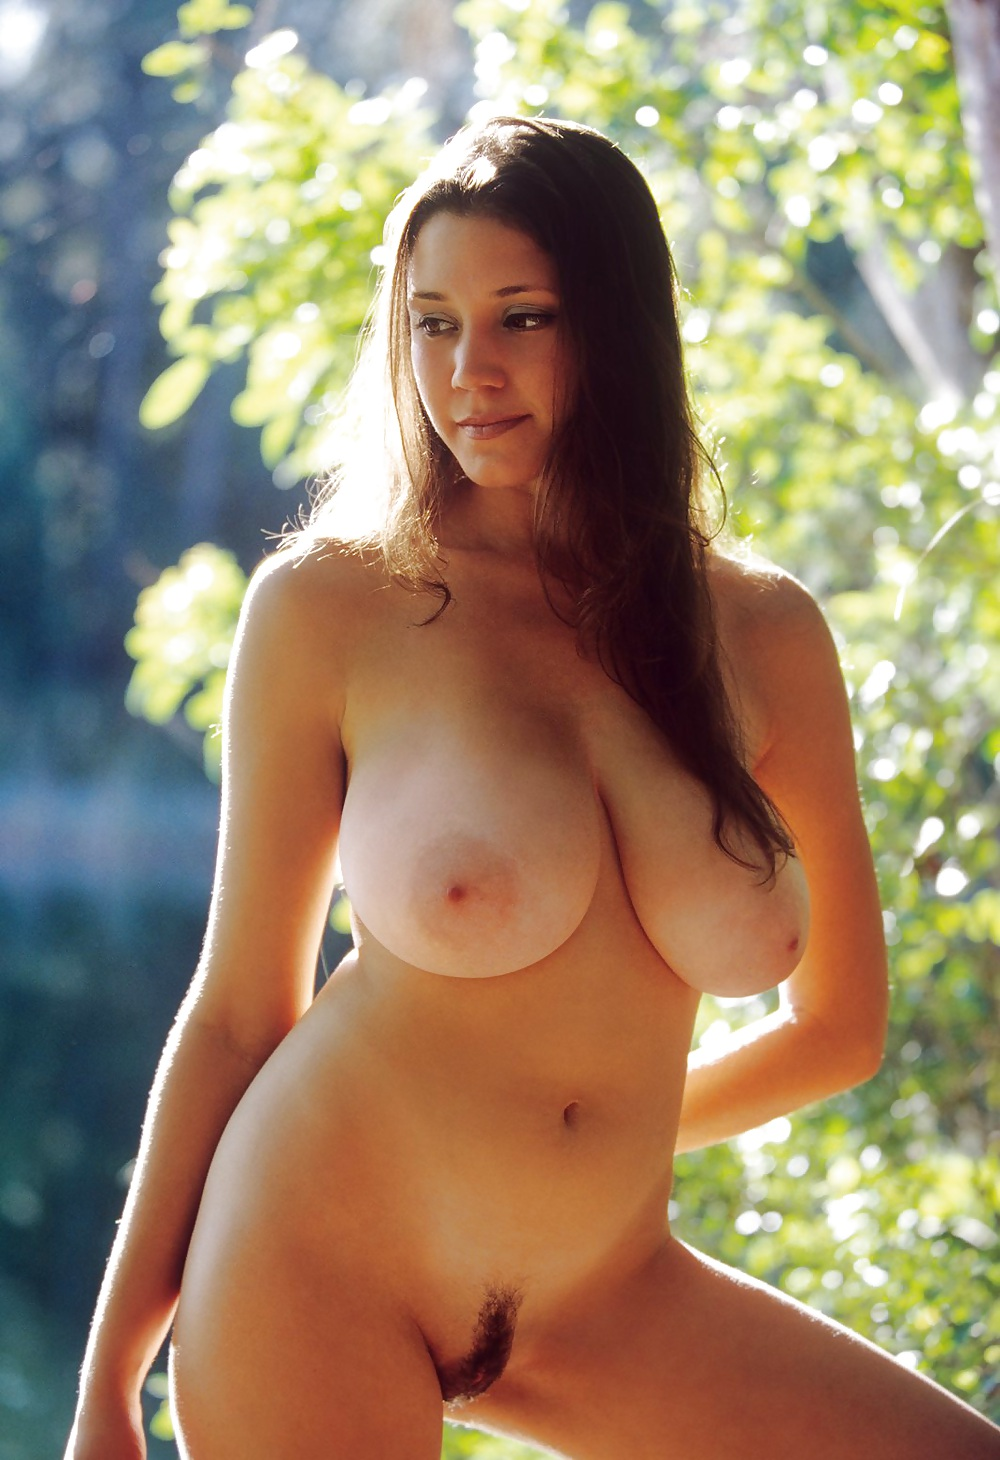 Miriam gonzalez nude pics and pics